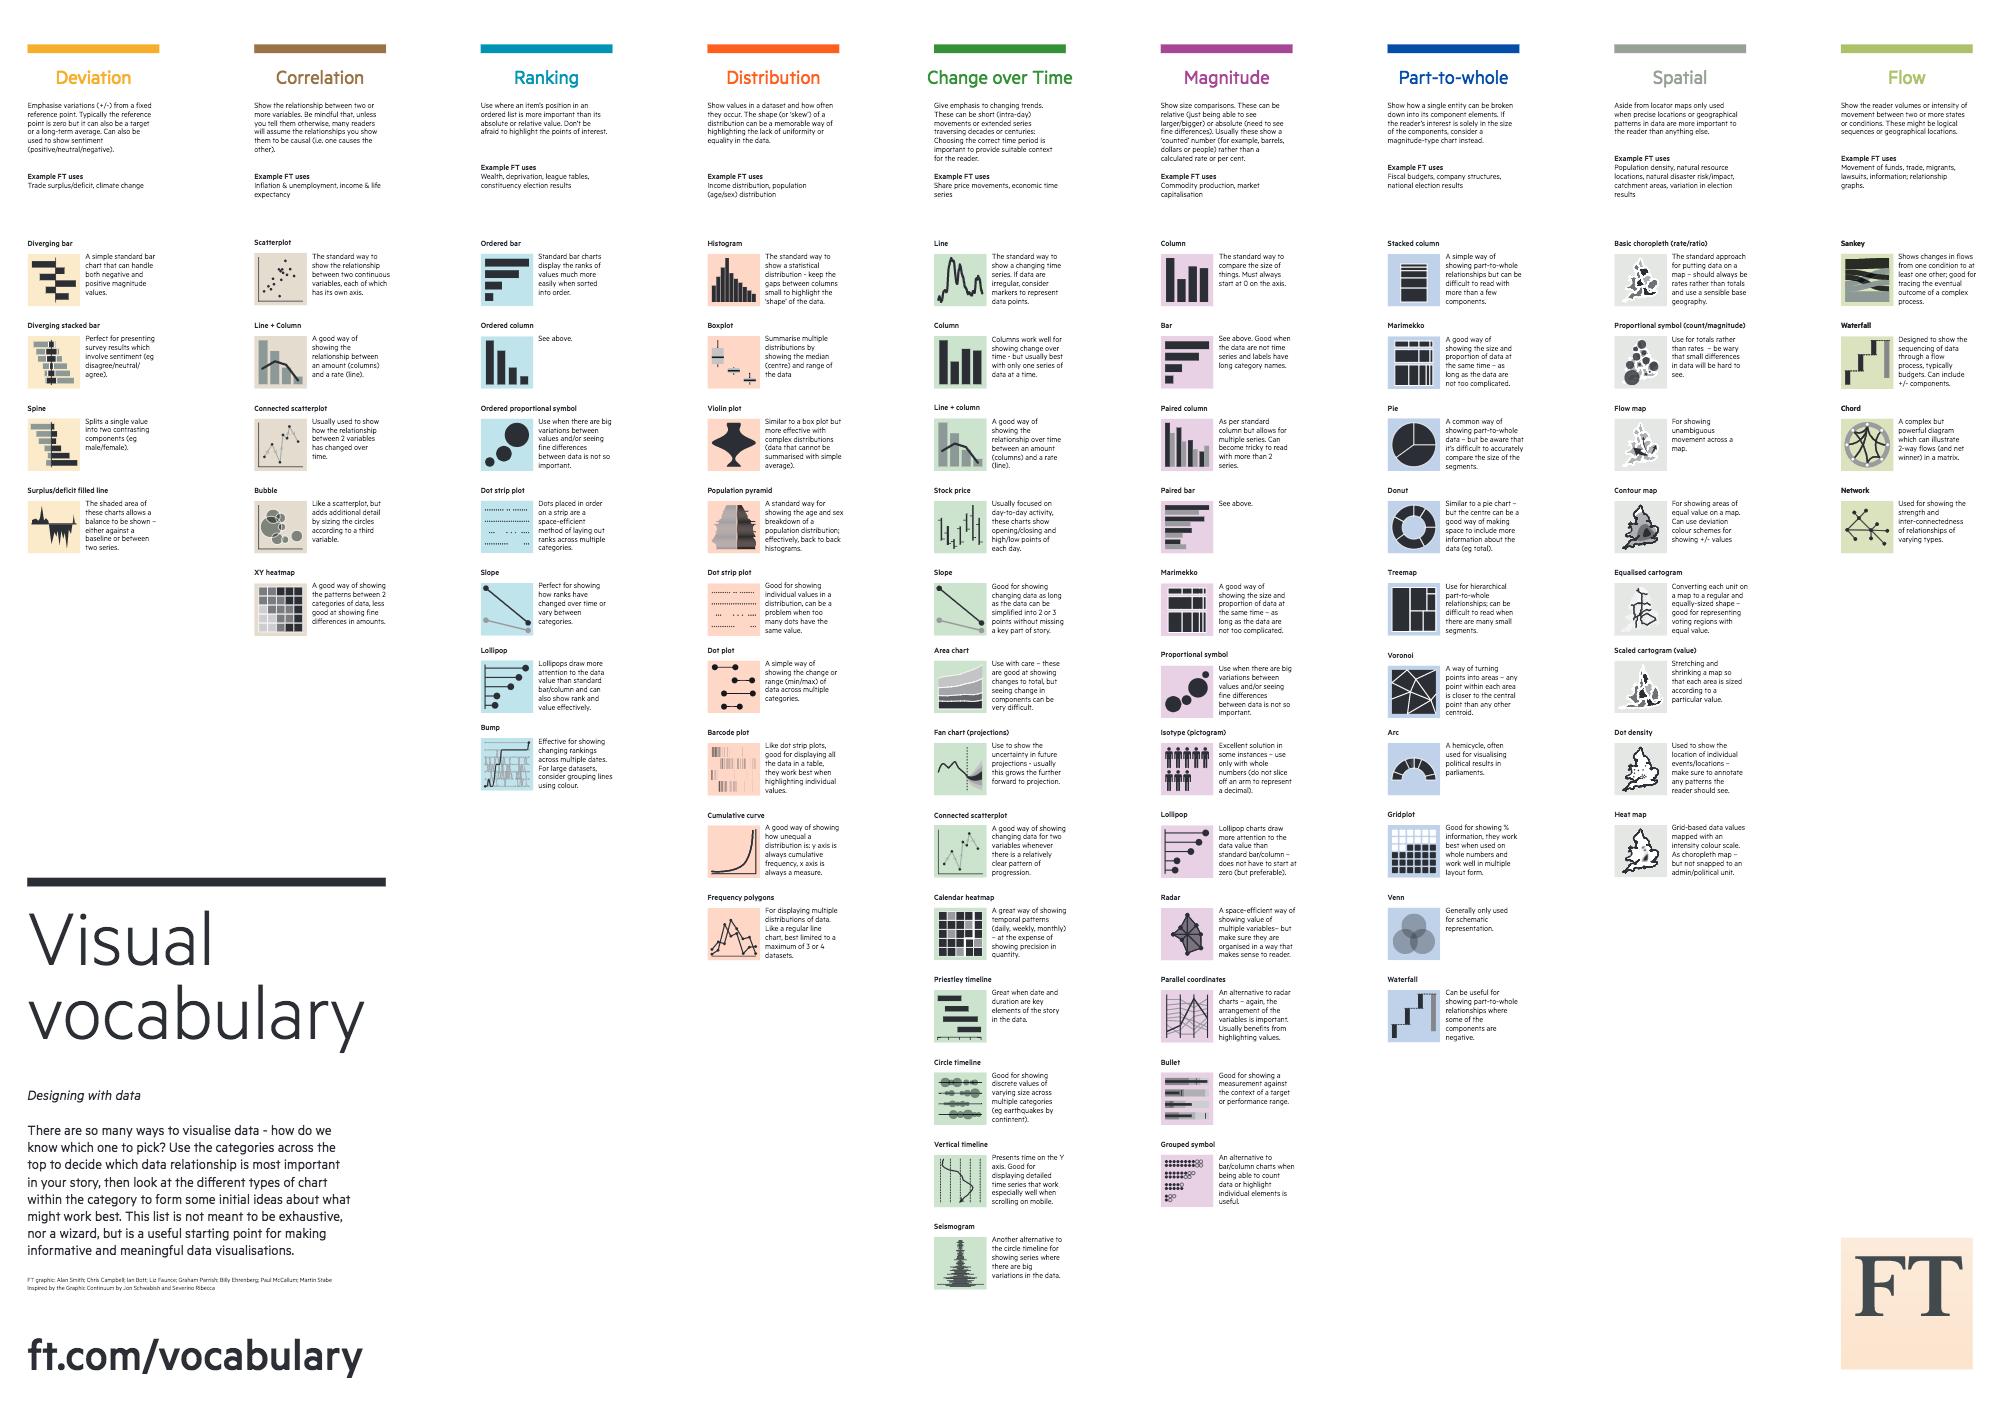 Visual Vocabulary A List Of Chart Types Interactive Charts Vocabulary Data Visualization